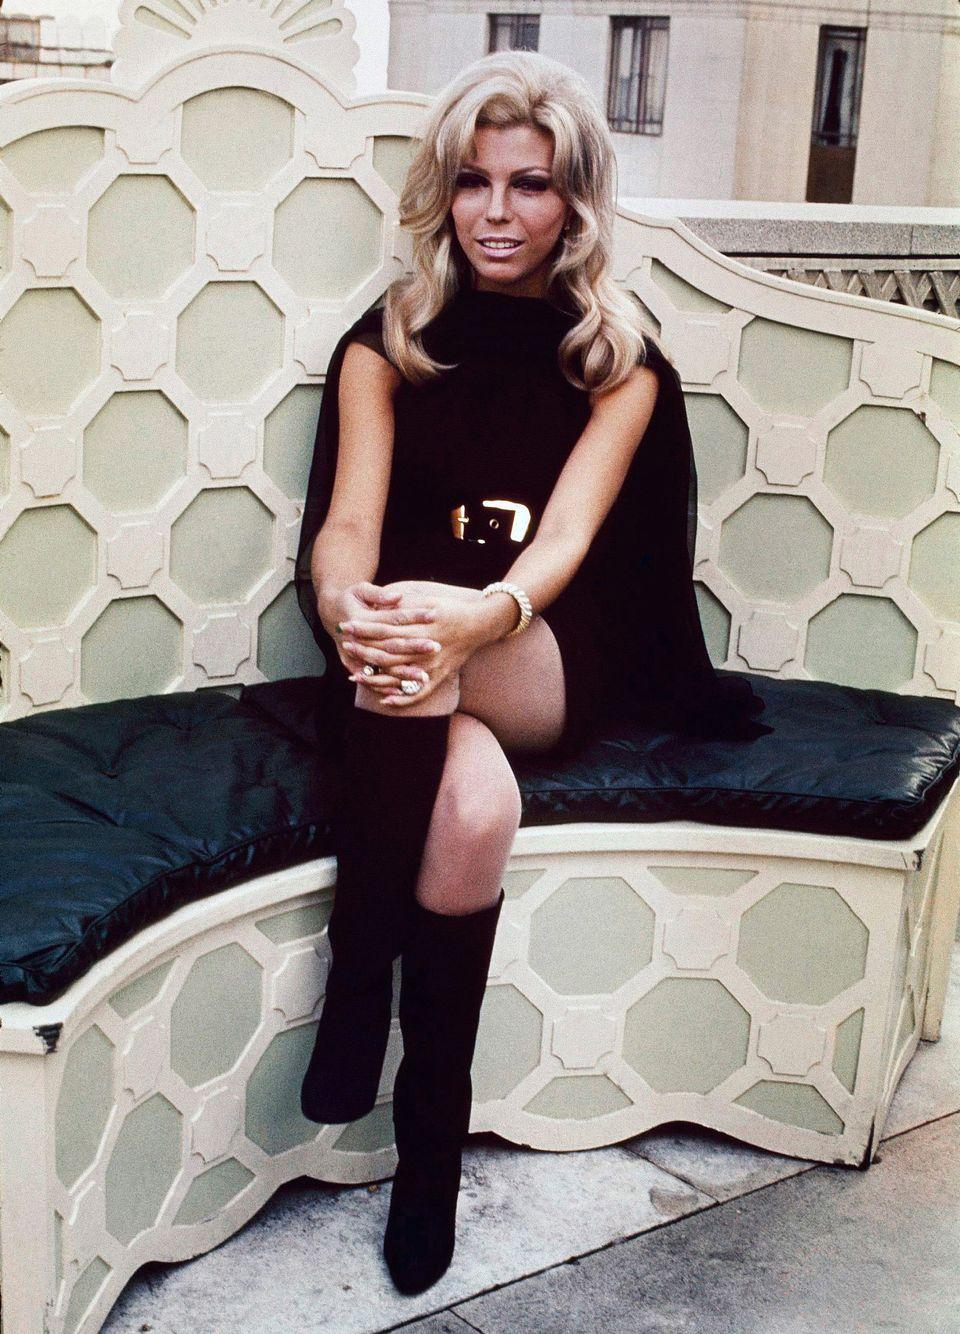 Nancy Sinatra shot wearing black leather boots in 1967. (AP Photo)